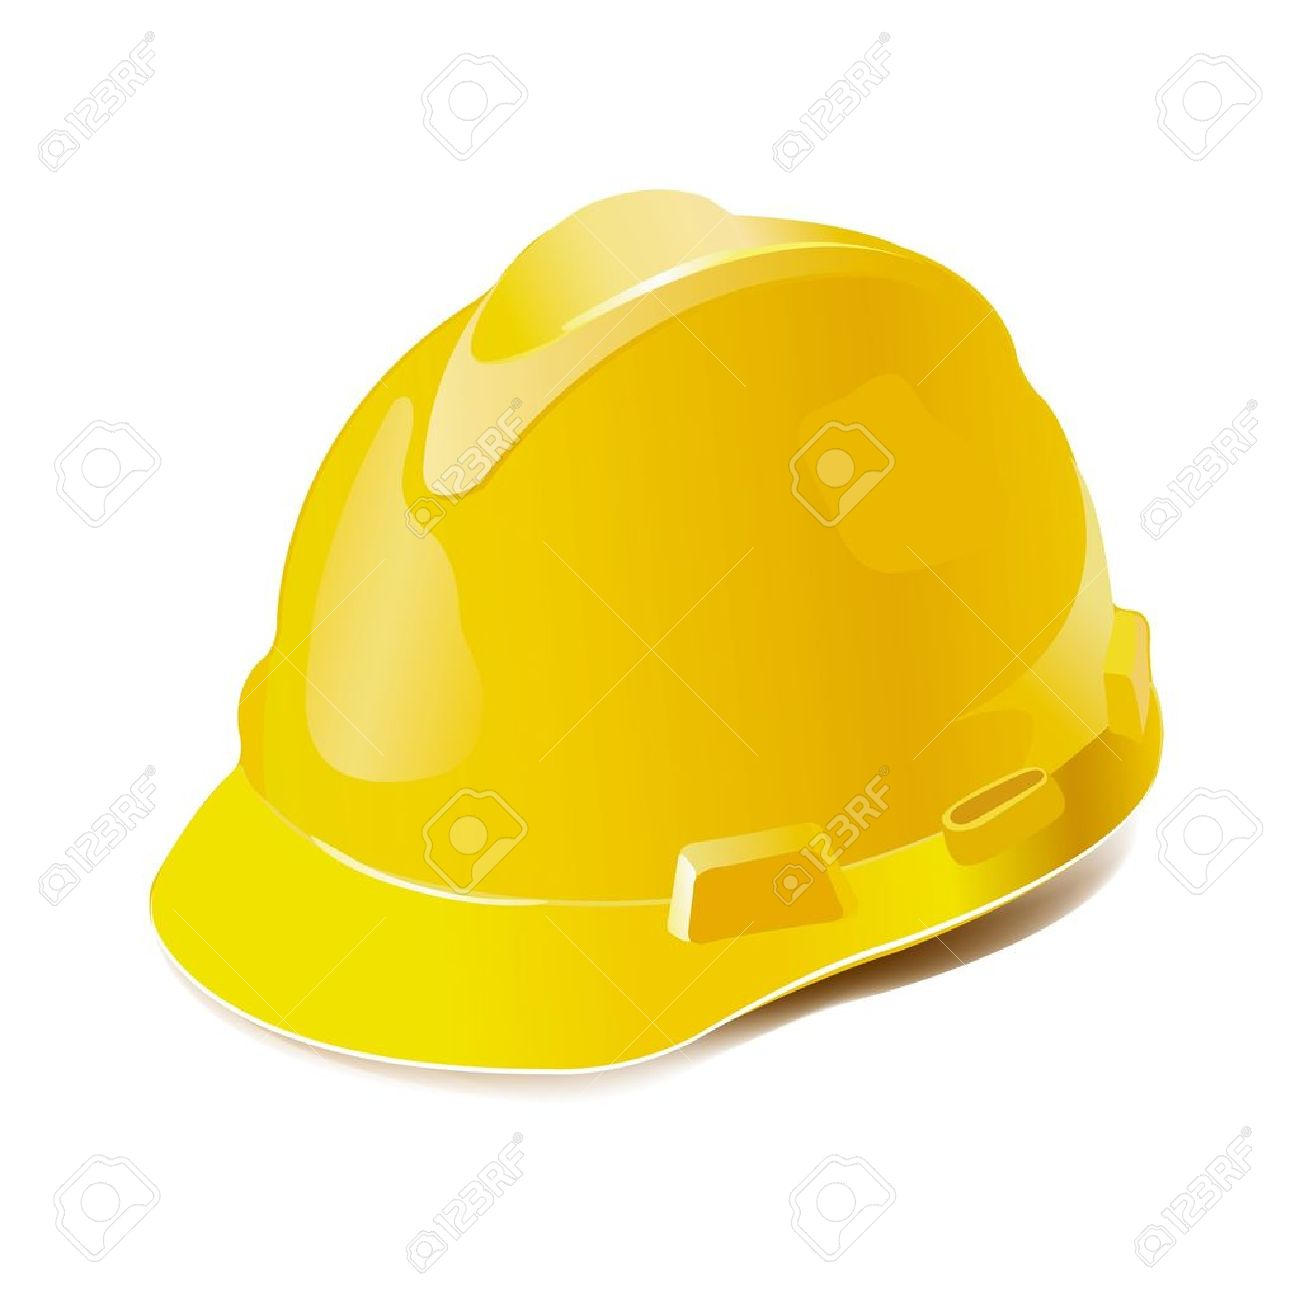 Yellow hard hat clipart.